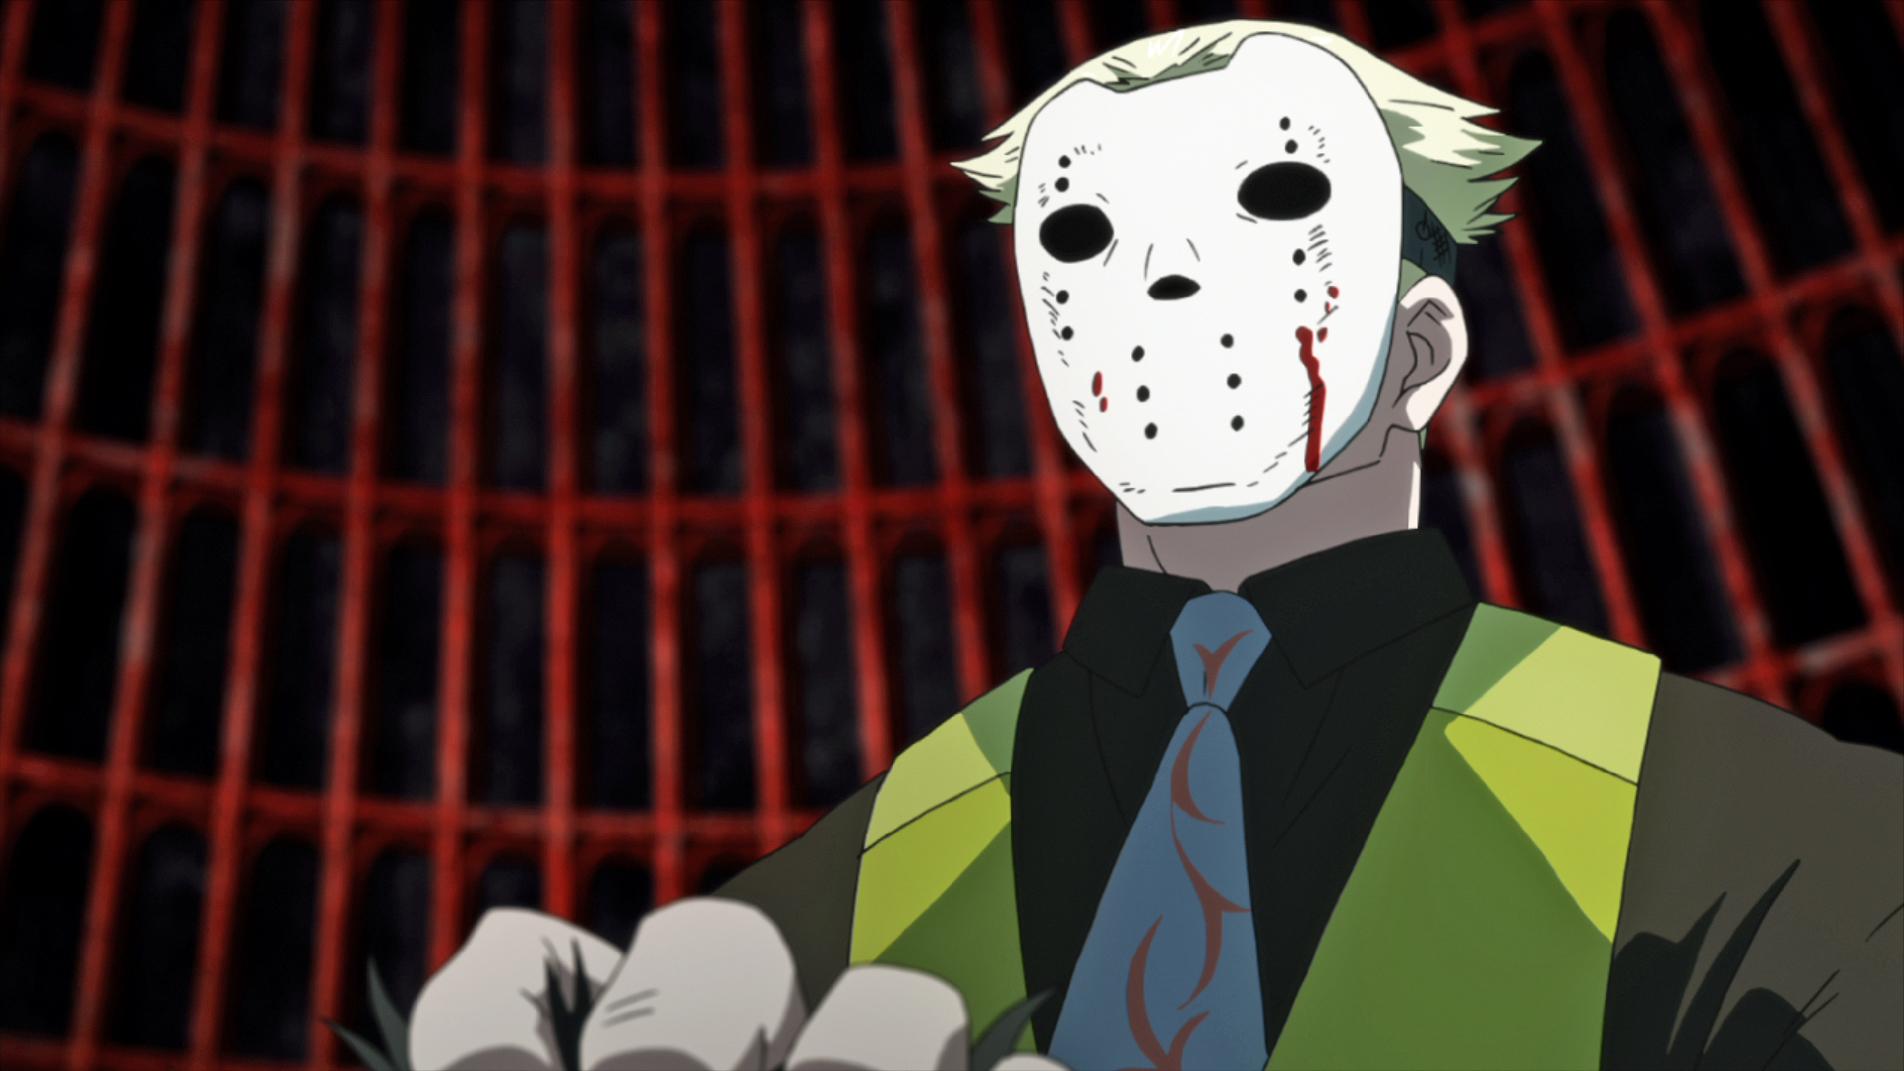 Watch Tokyo Ghoul Season 1 Episode 12 Sub & Dub | Anime